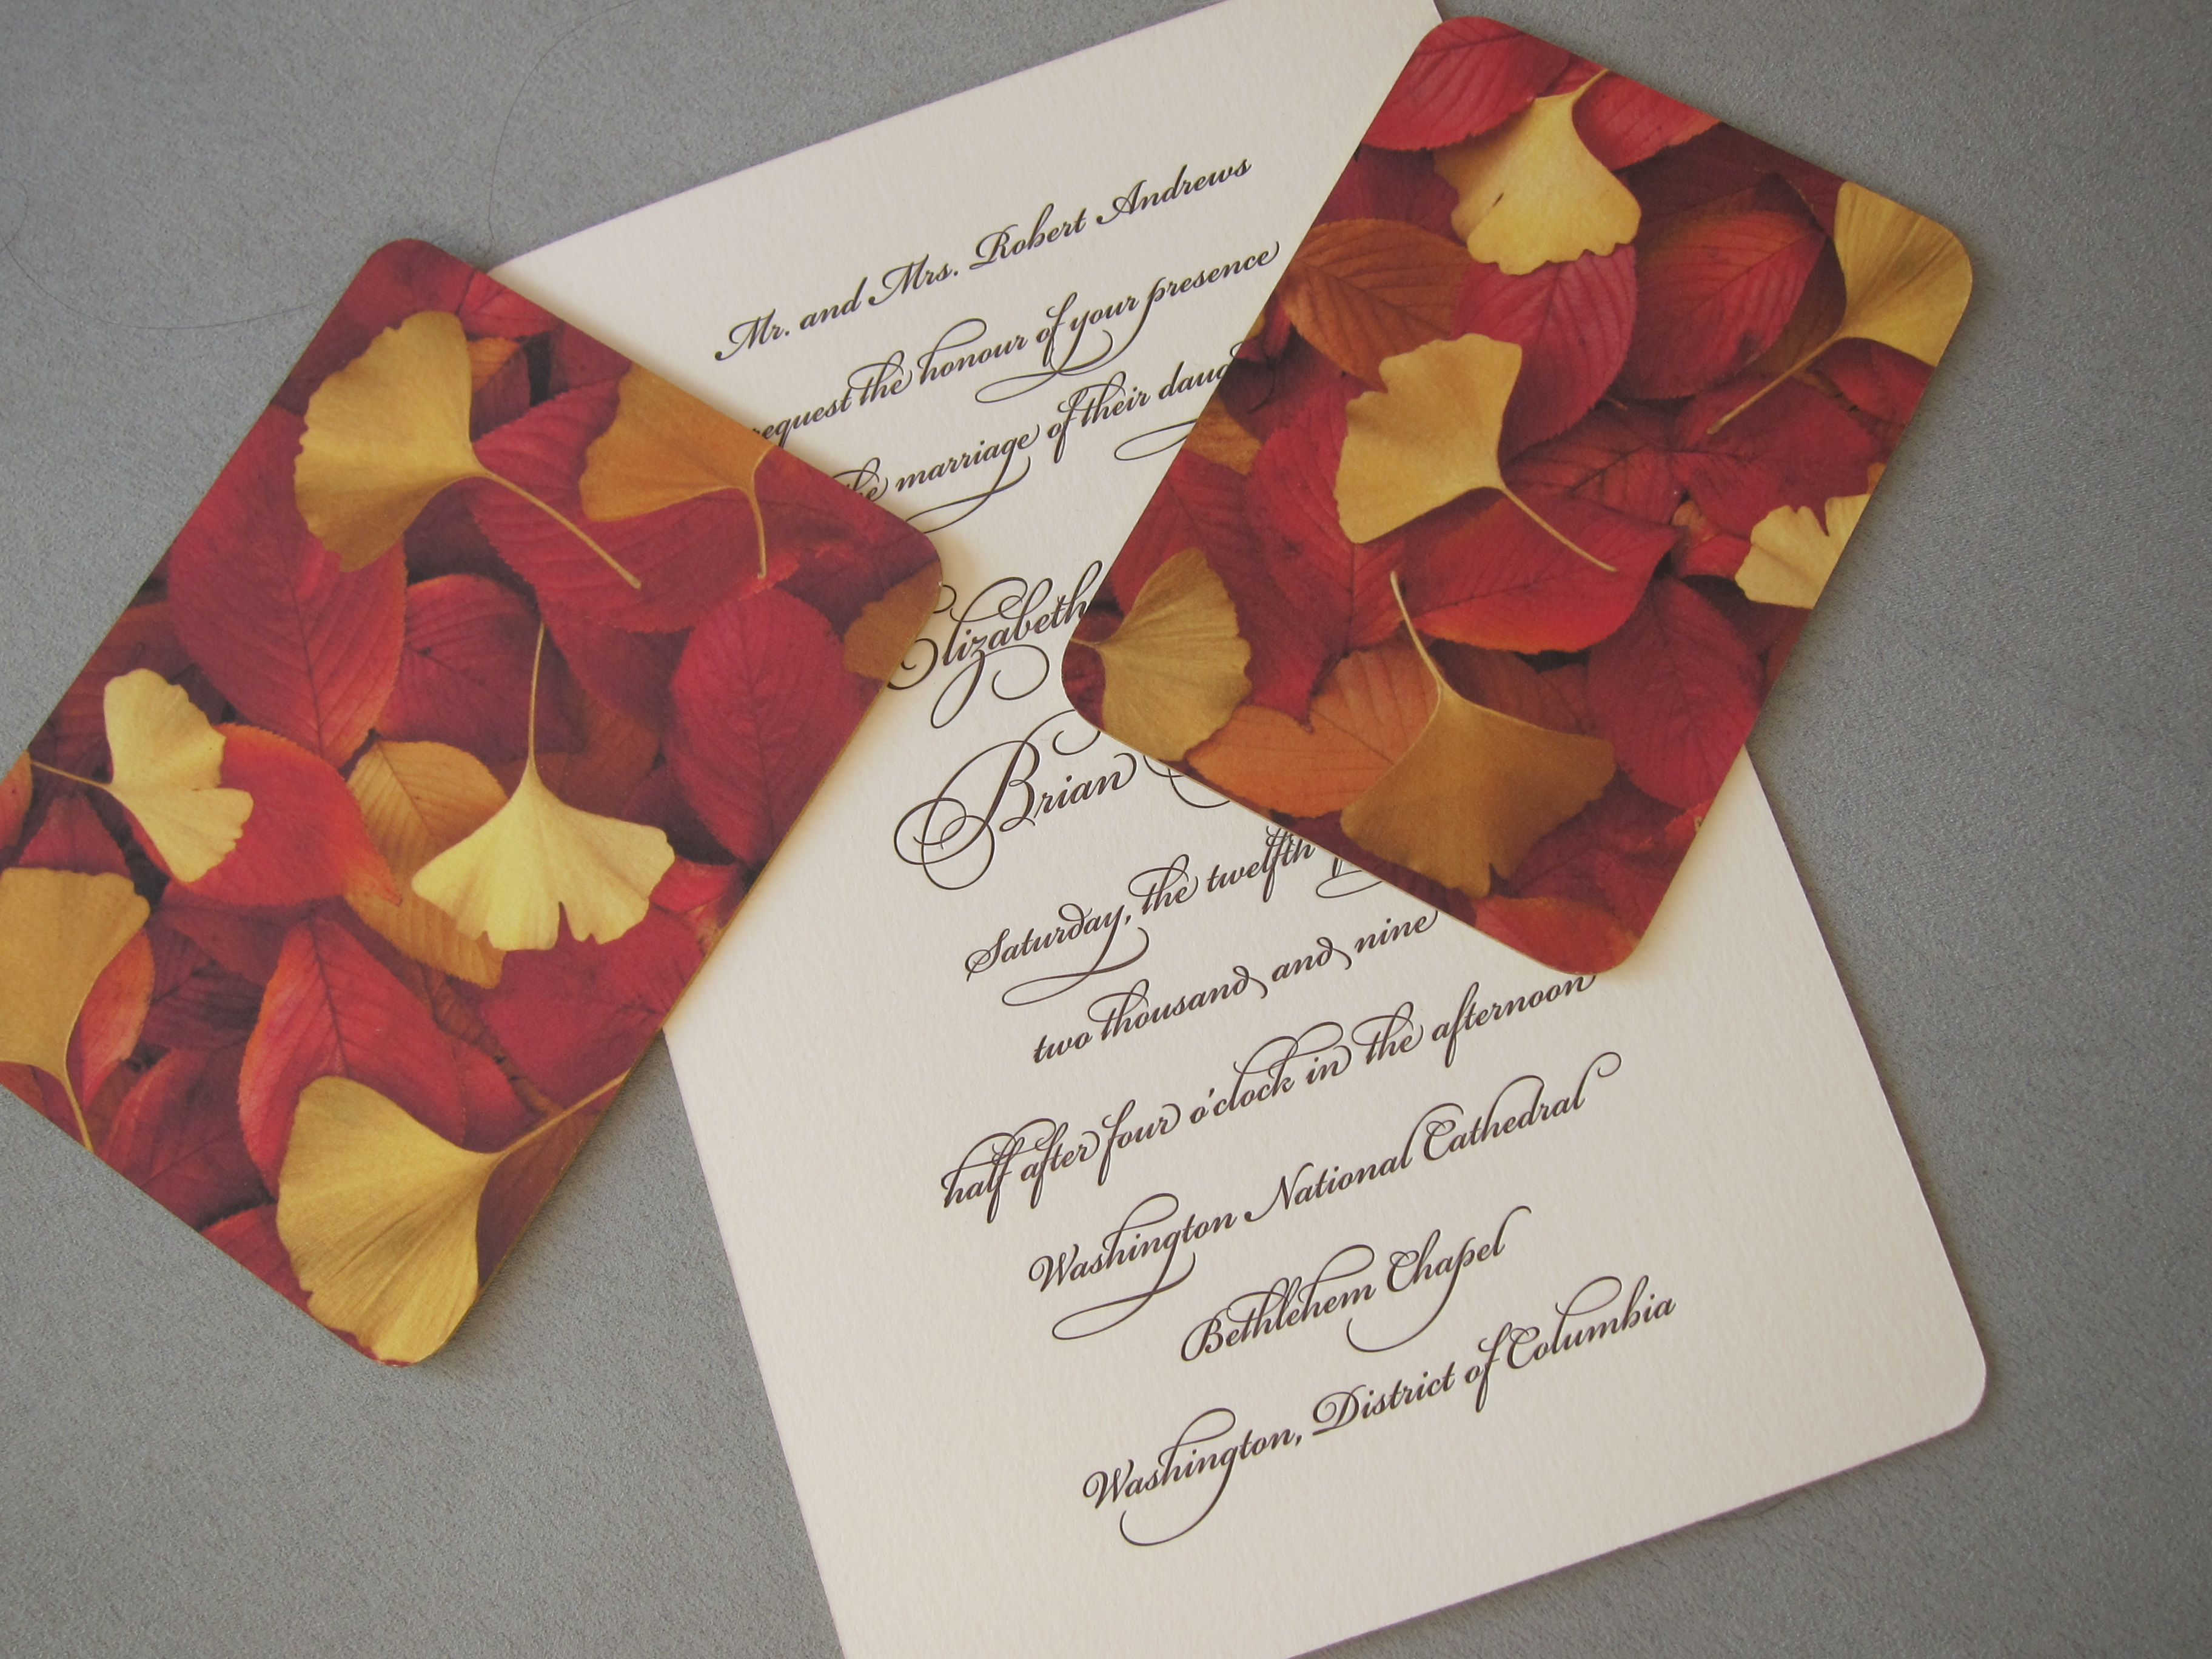 Julie Holcomb Letterpress Wedding Invitations | VERMONT WEDDING PARLOR